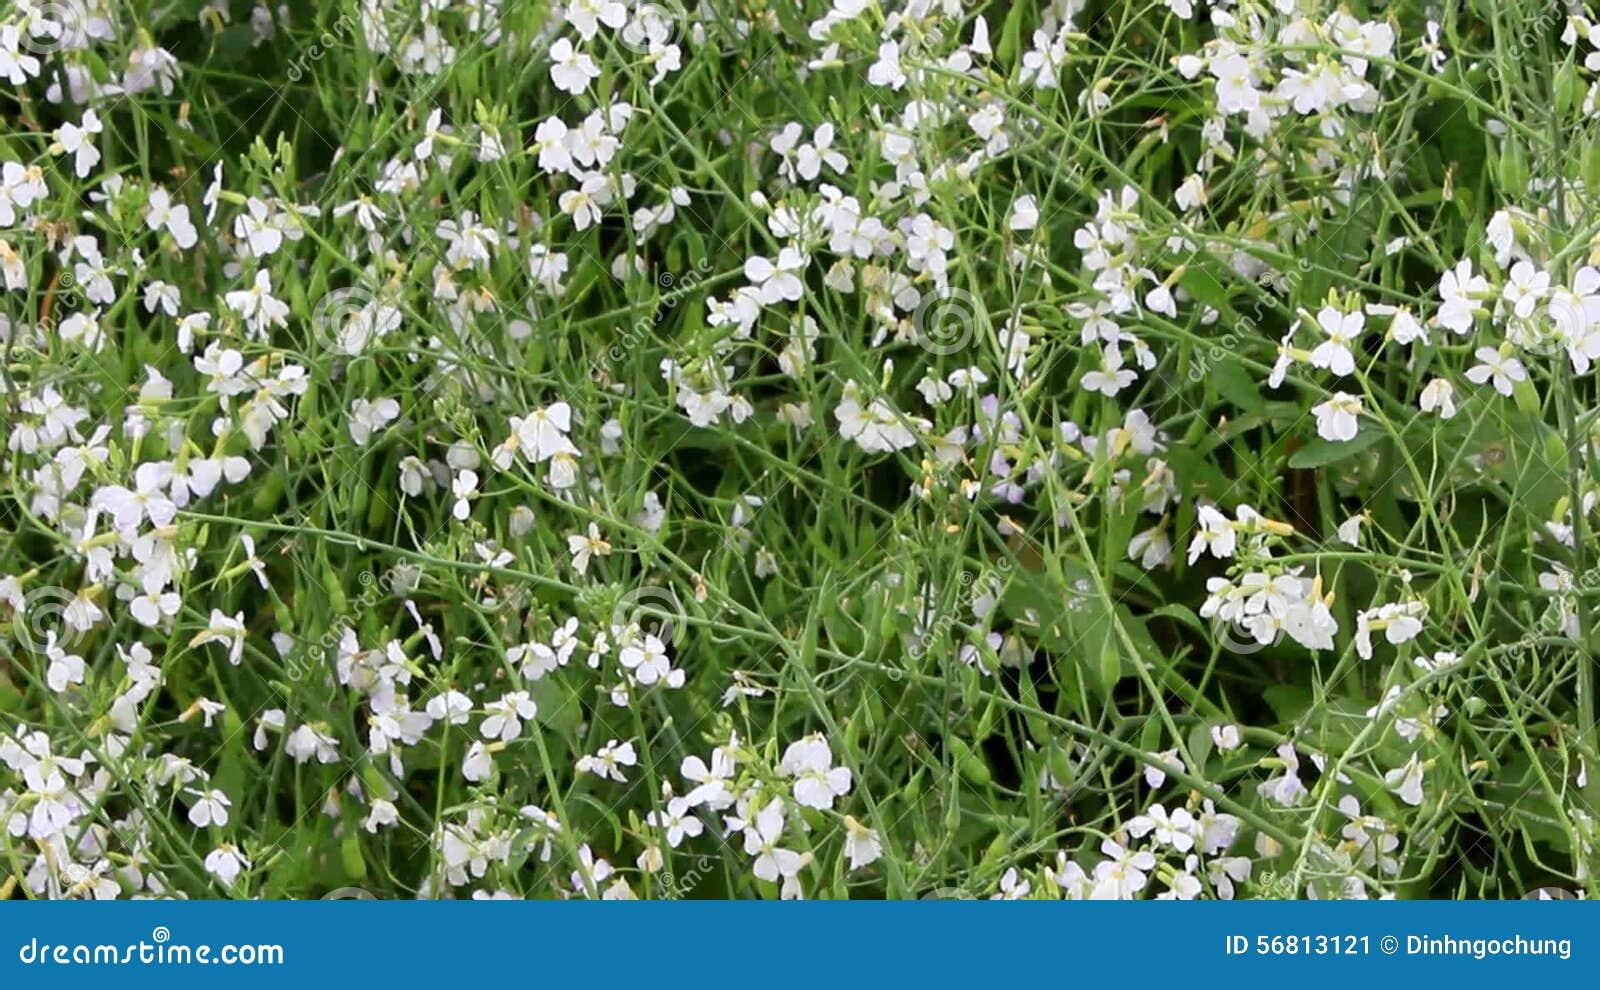 White Flowers In The Vegetable Garden Stock Video Video Of